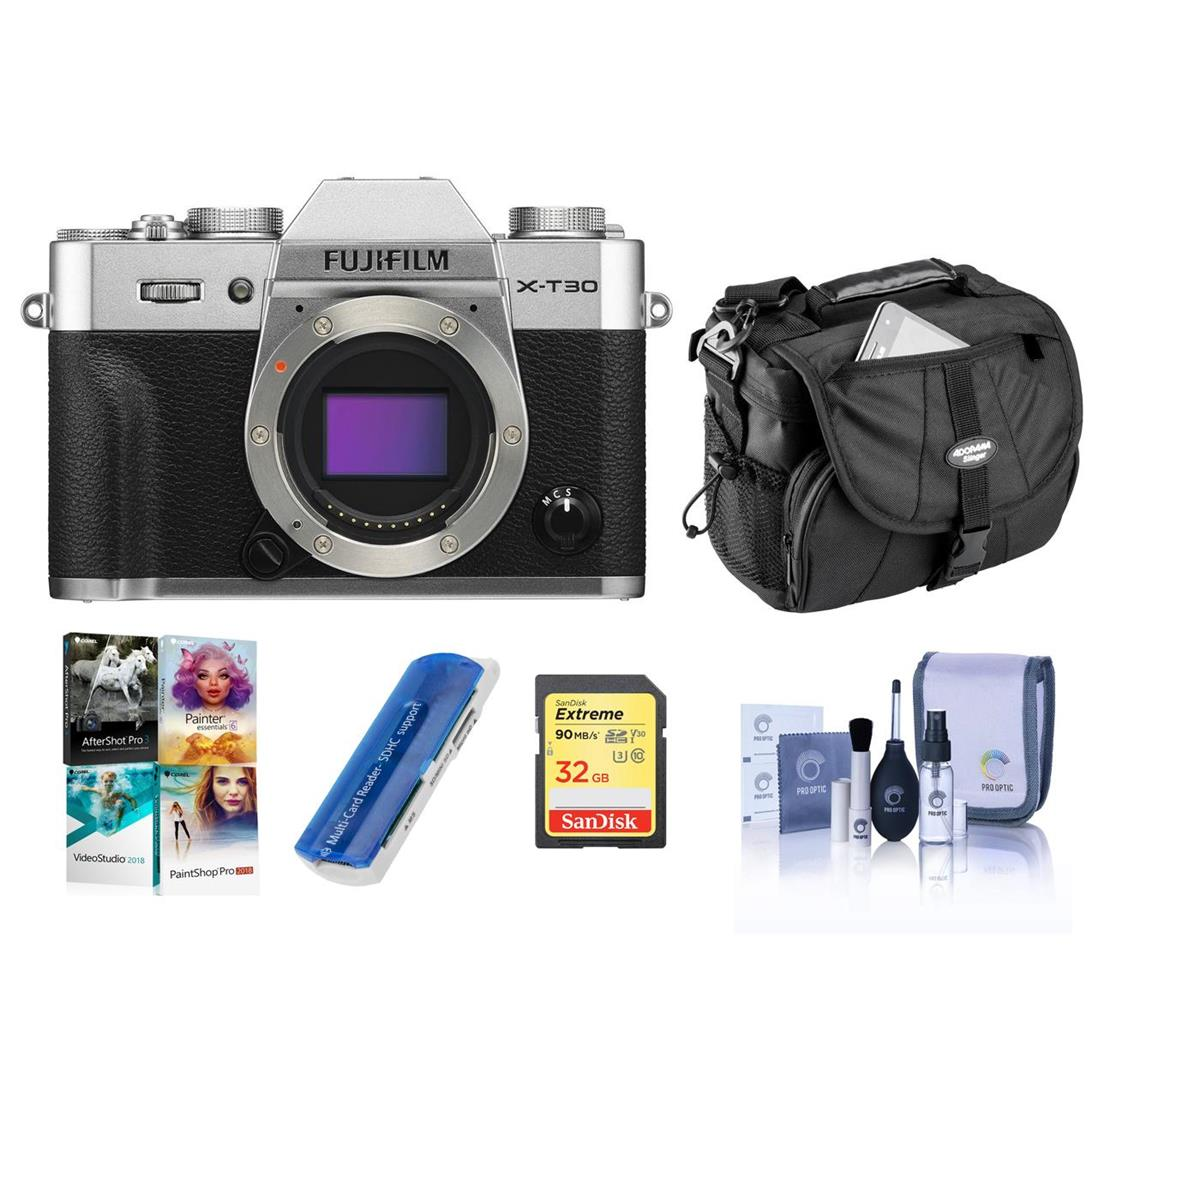 Hot Deal: Fujifilm X-T30 Camera Bundles Body + Acc Kit for $799!